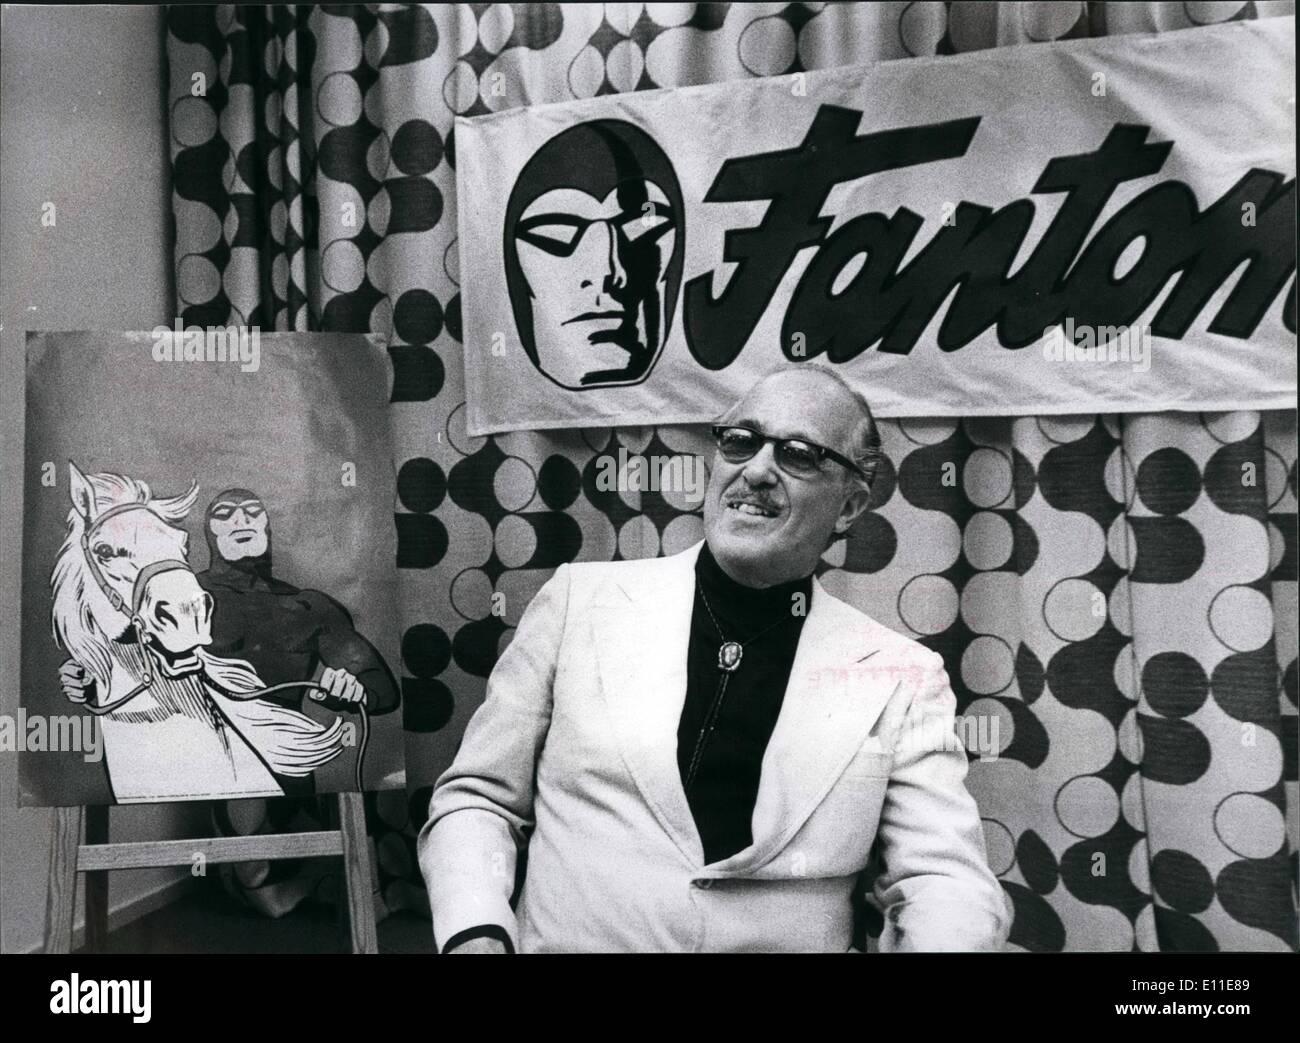 "Sept. 09, 1977 - Lee Falk, geistiger Vater des Comic-Helden '' Mandrake der Magier '' und '' das Phantom "": Stockbild"